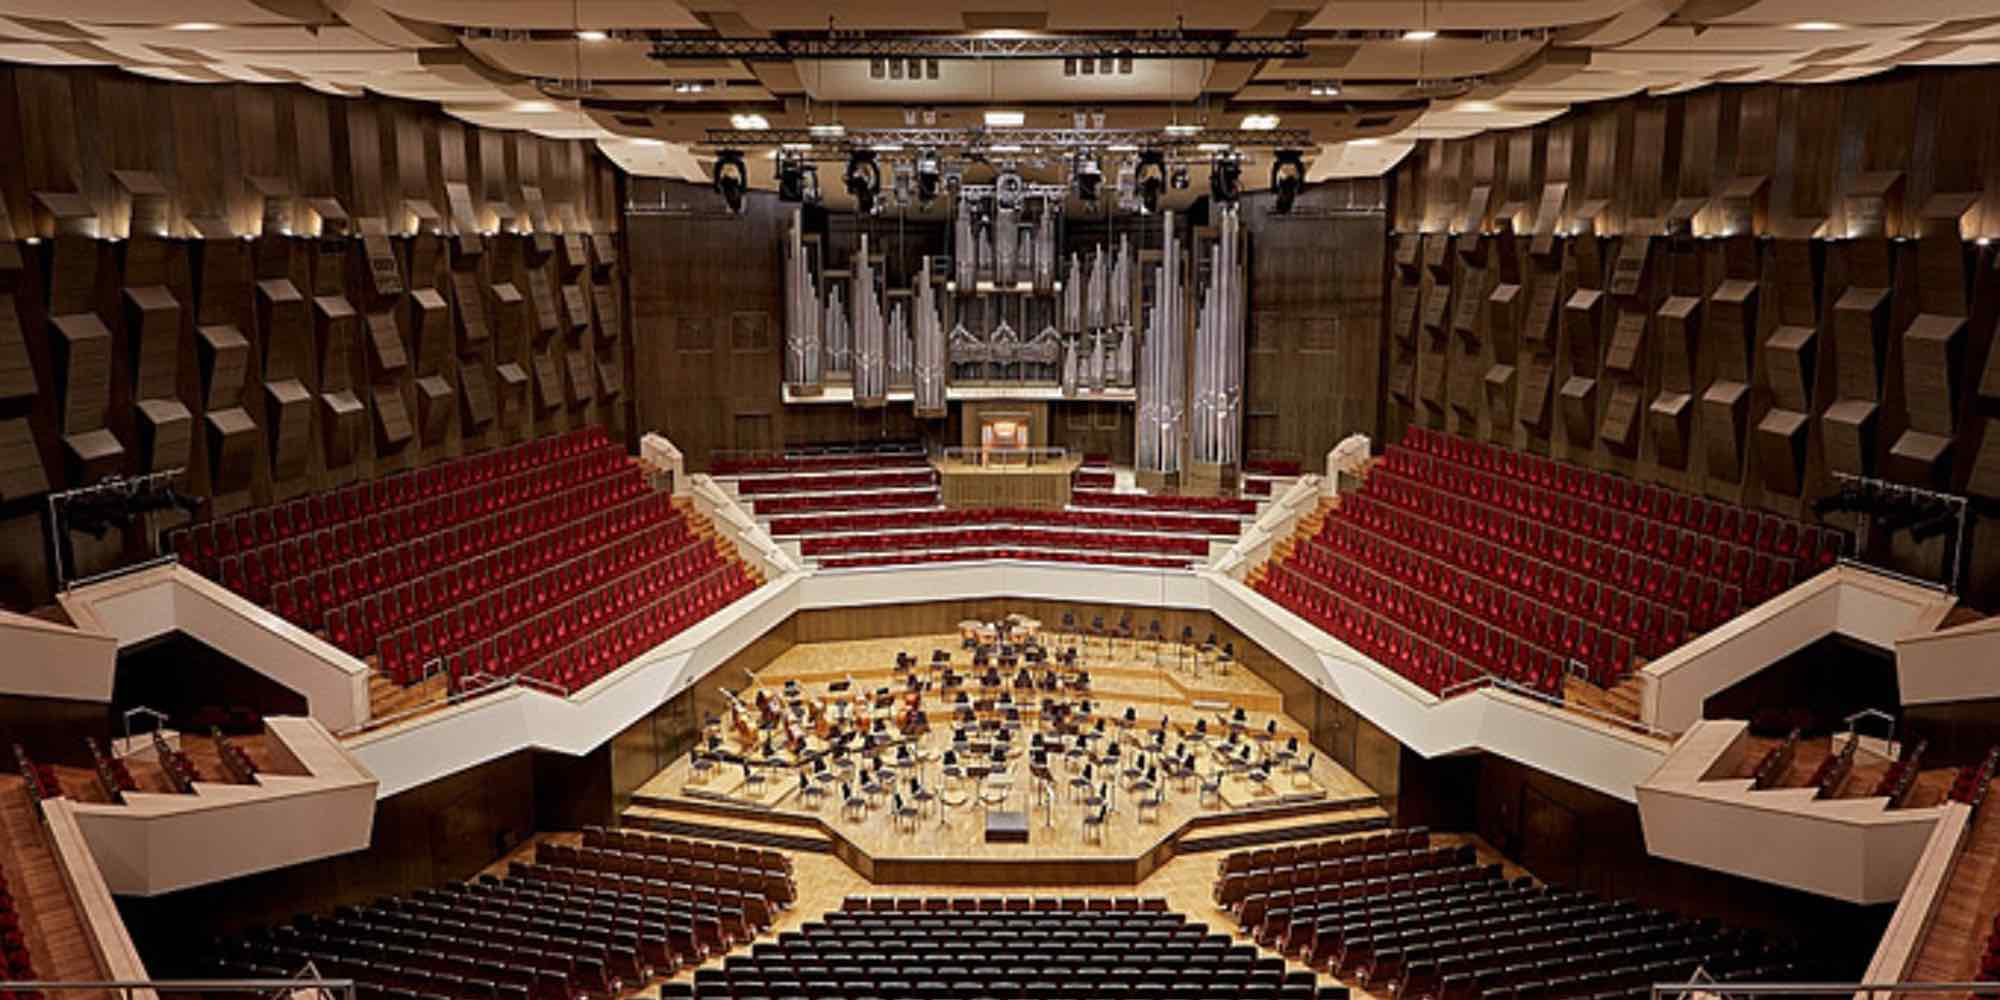 Armel Opera Festival<br>GERMANY